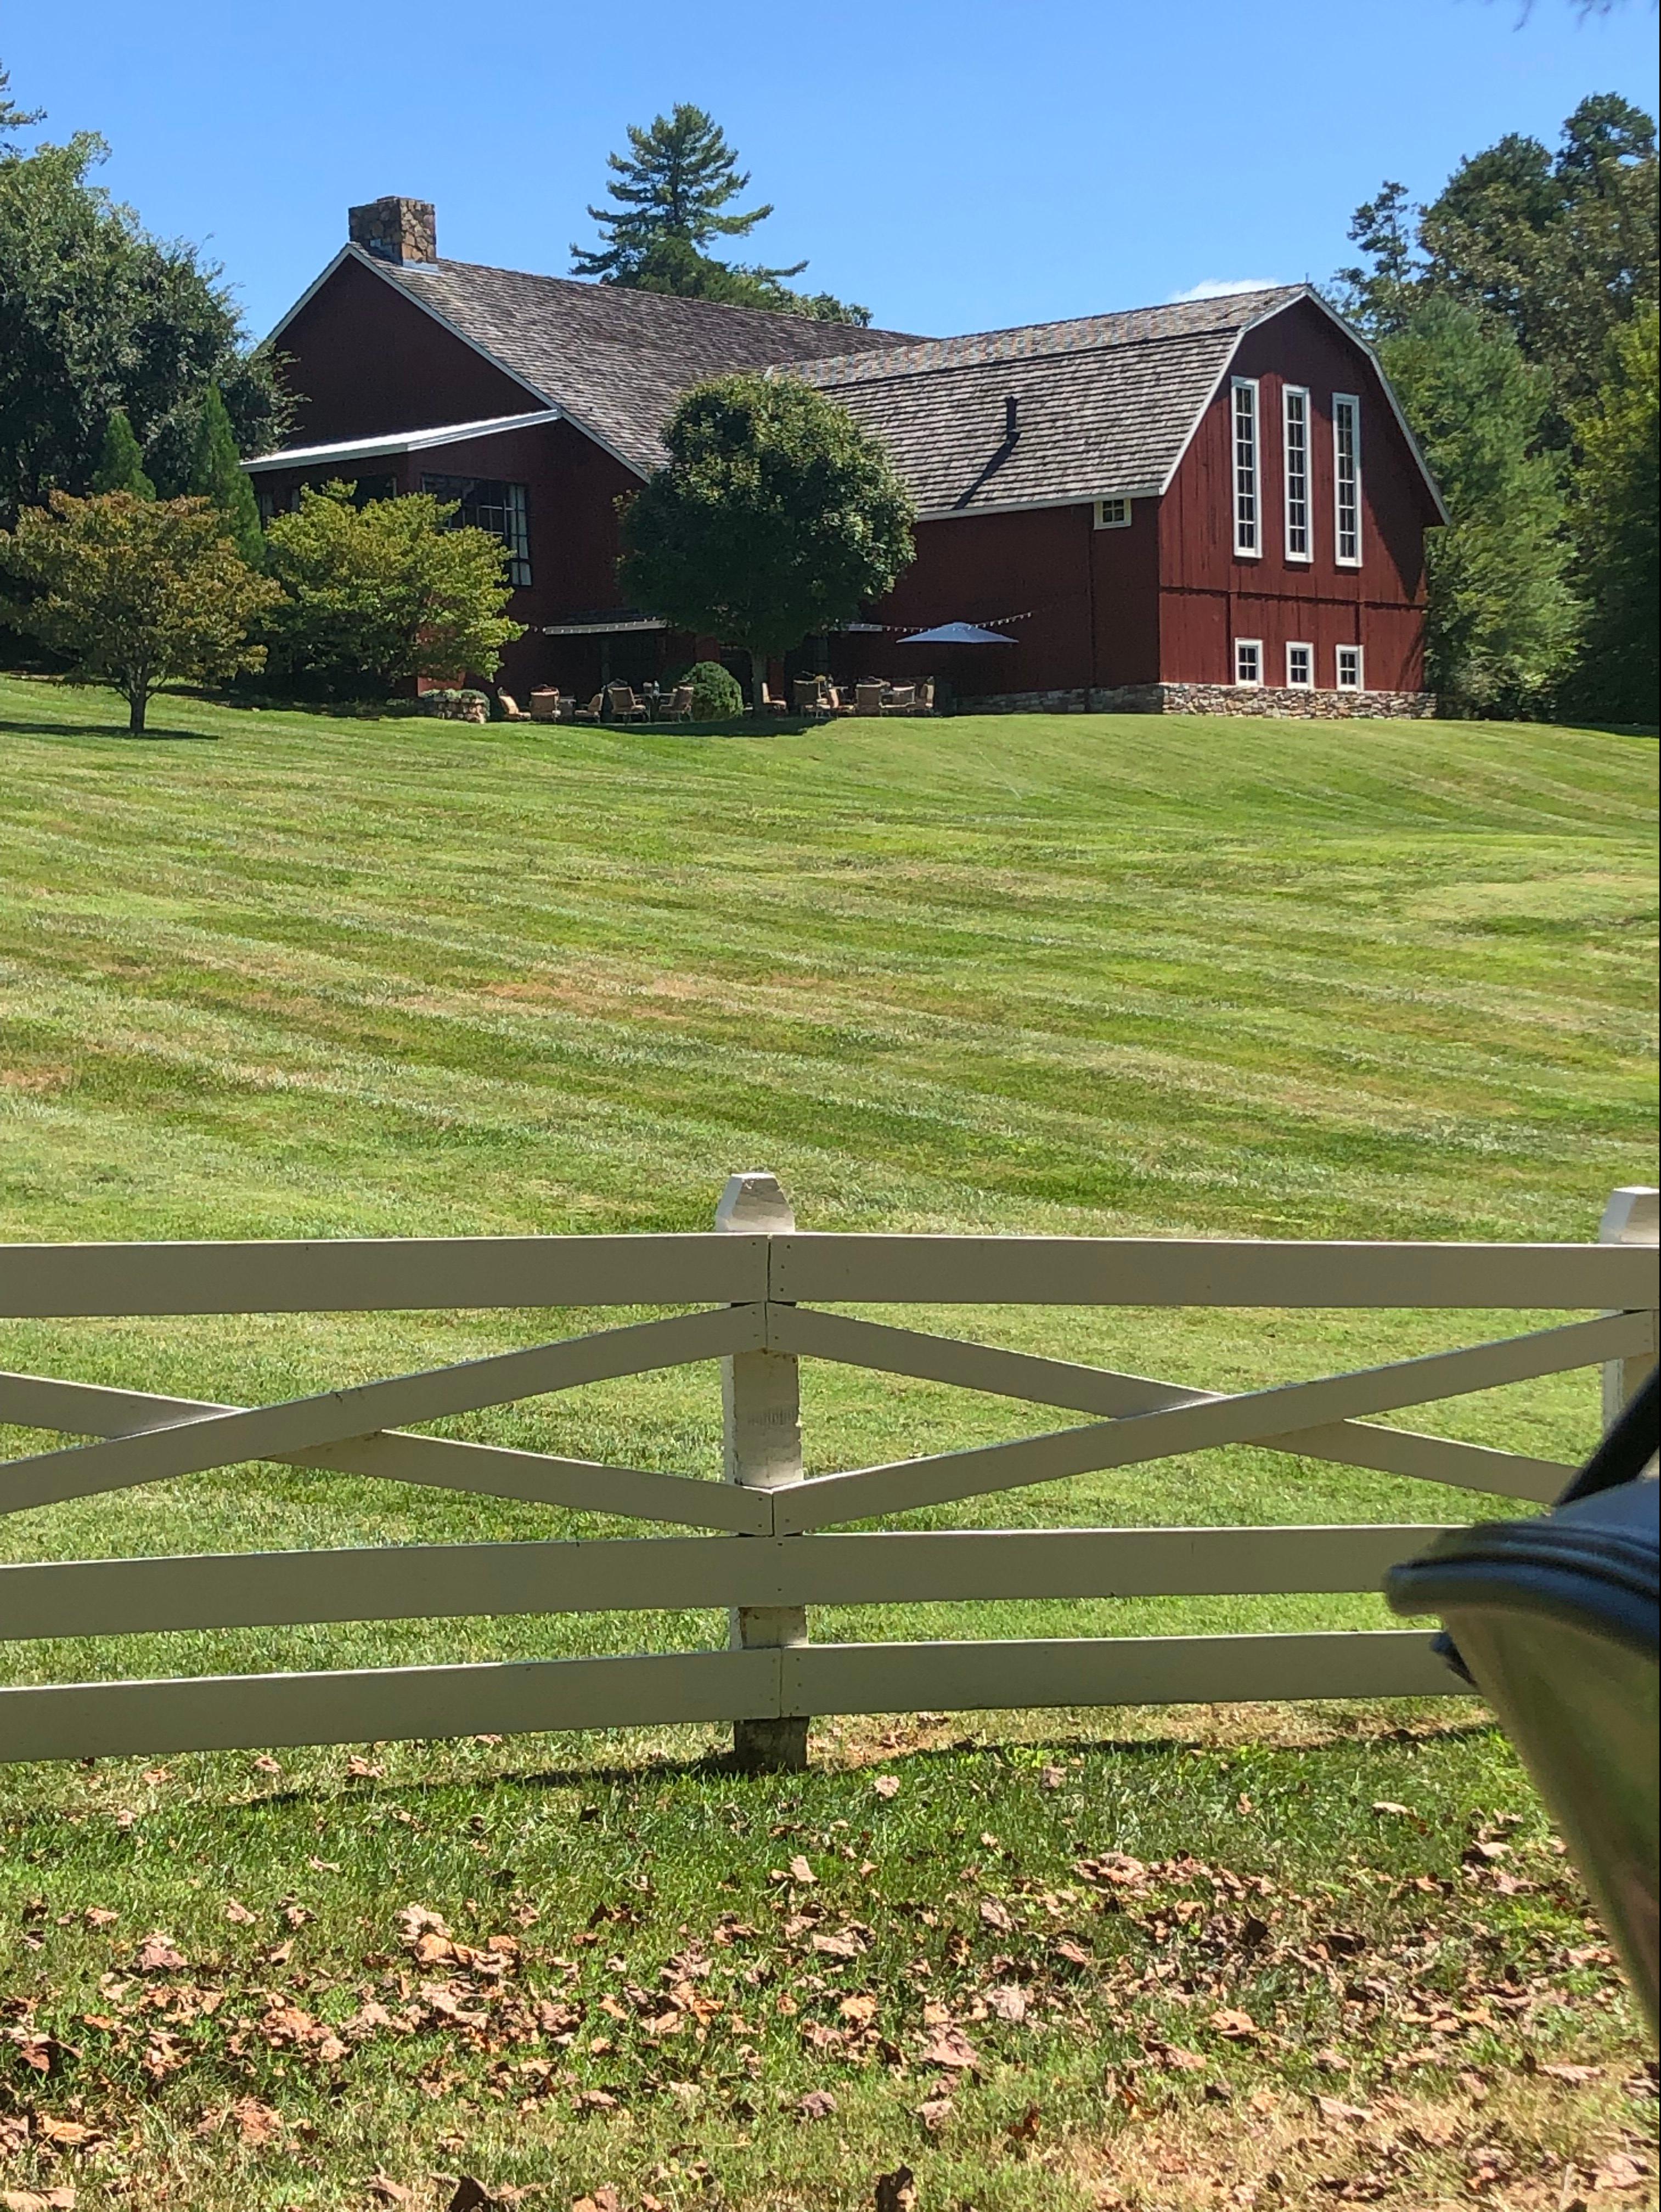 The Barn at Blackberry Farm